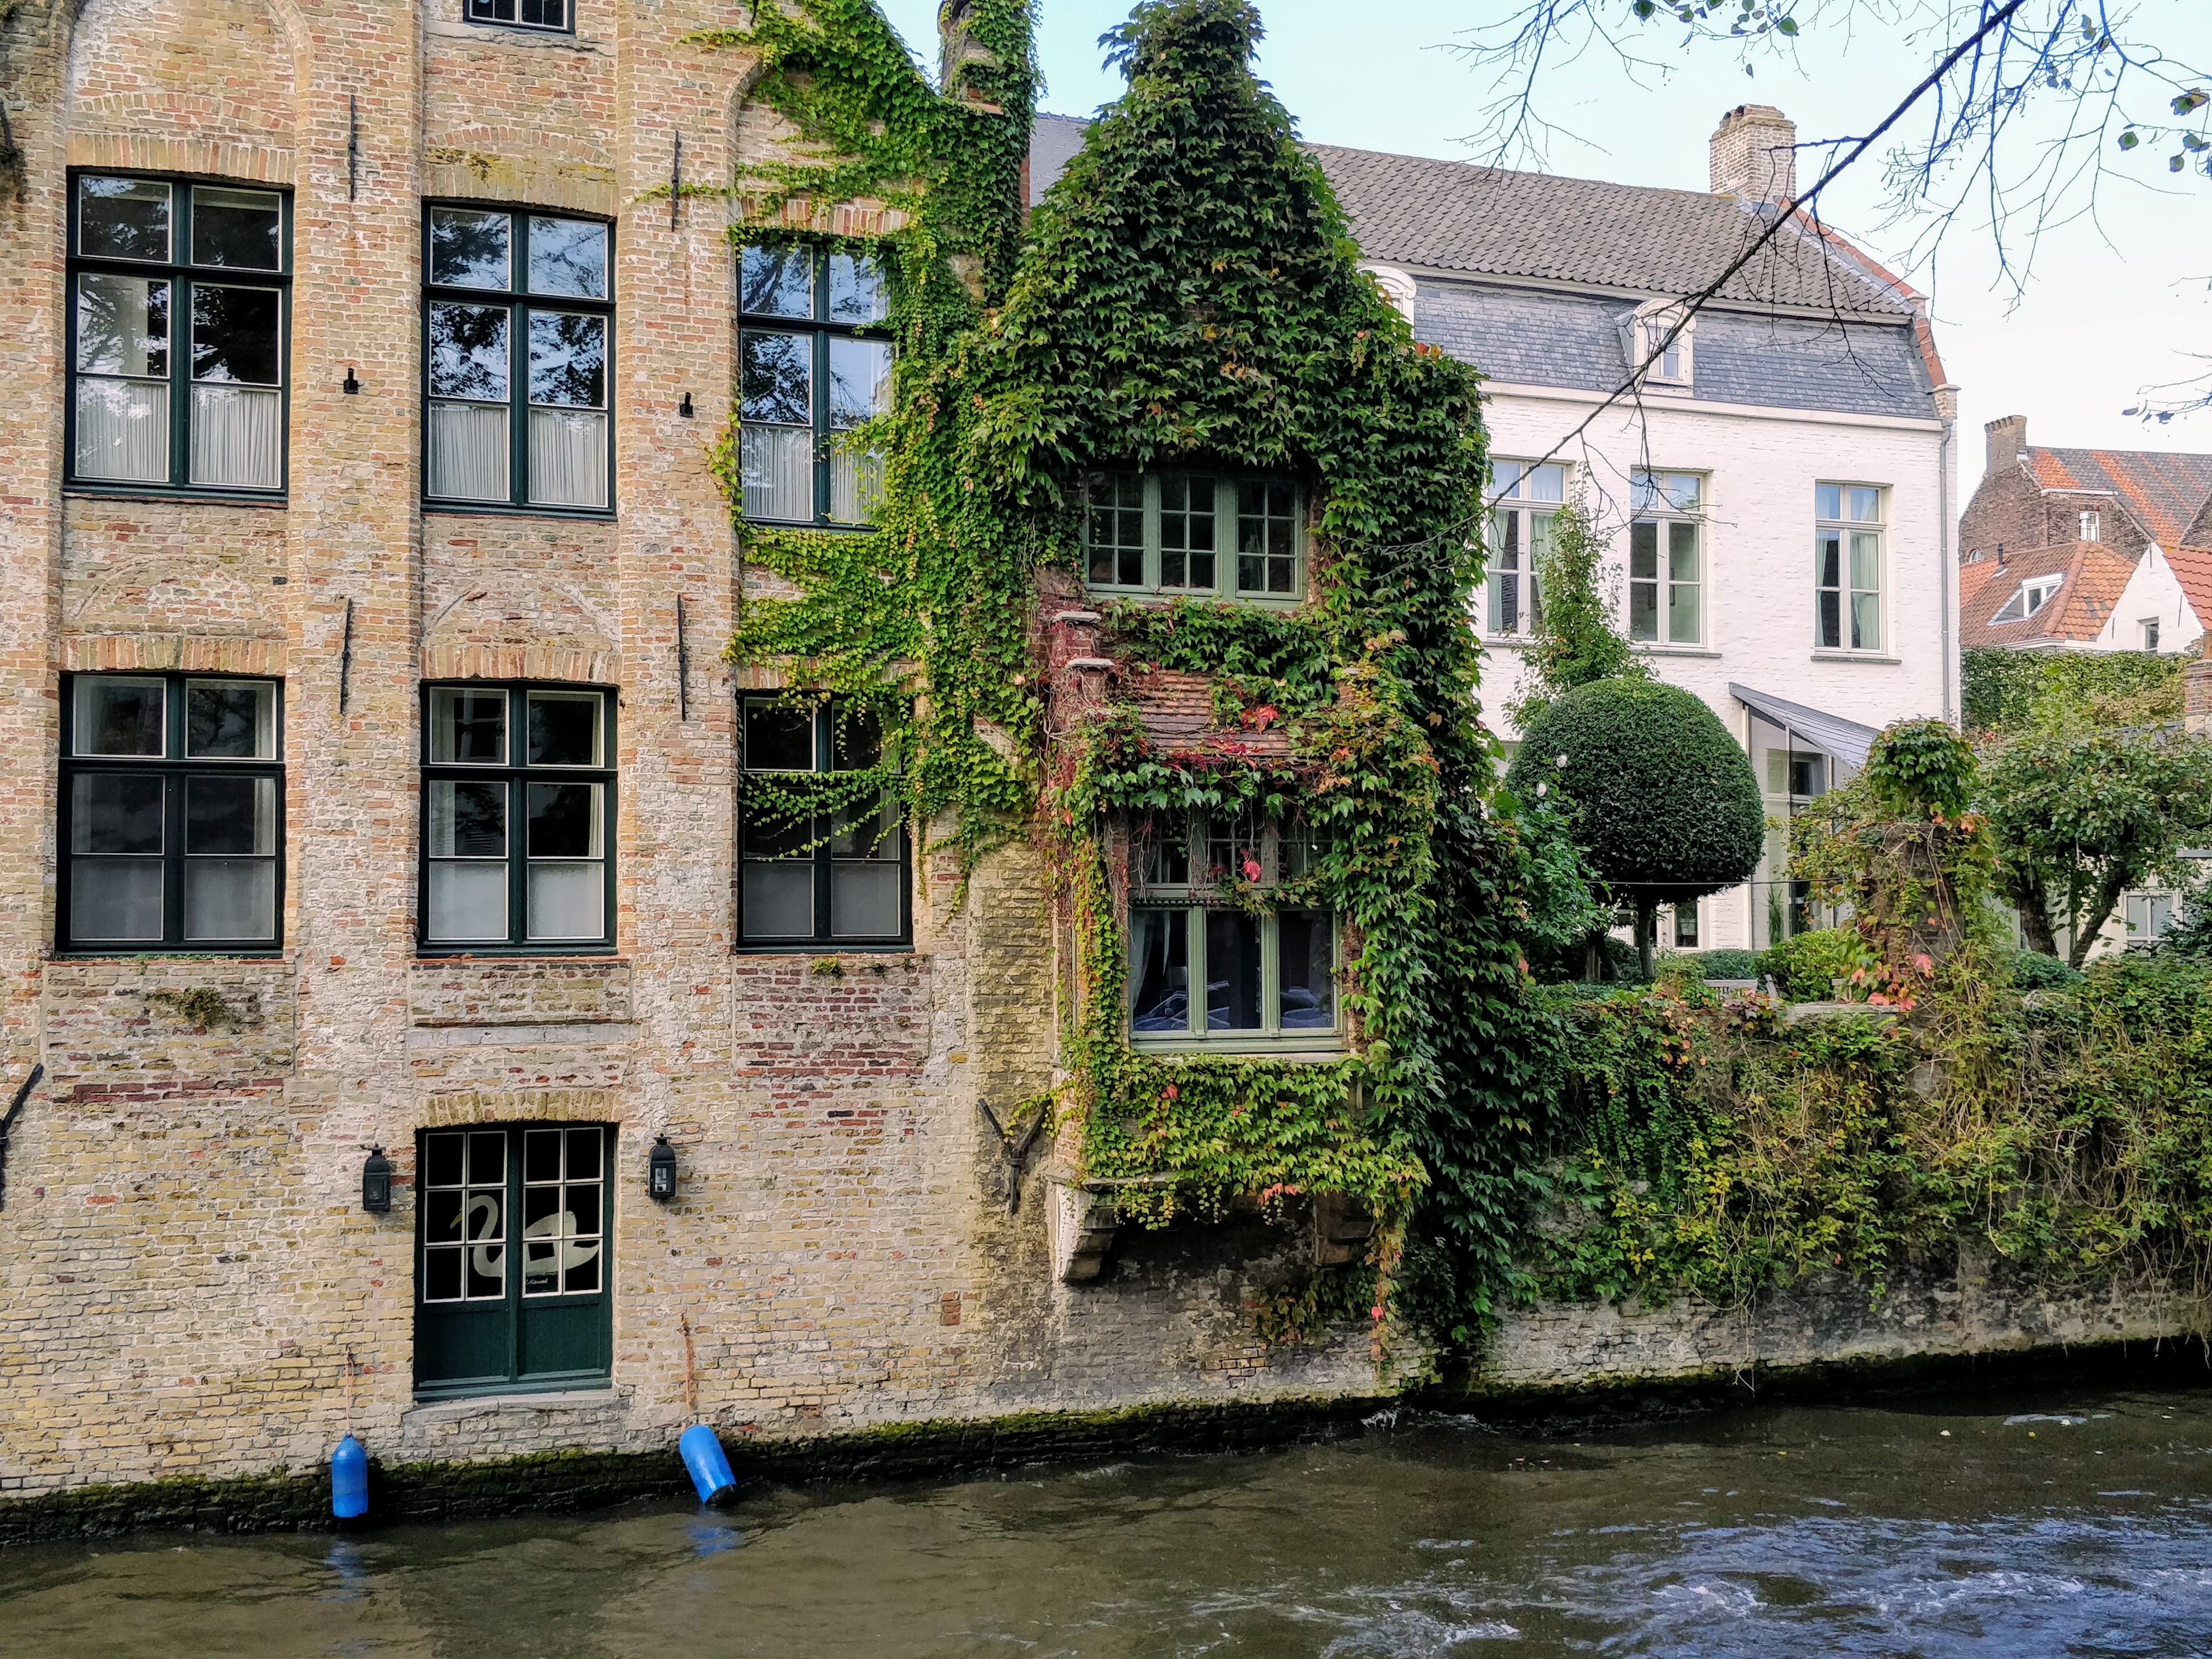 ez Brugge varázsa!